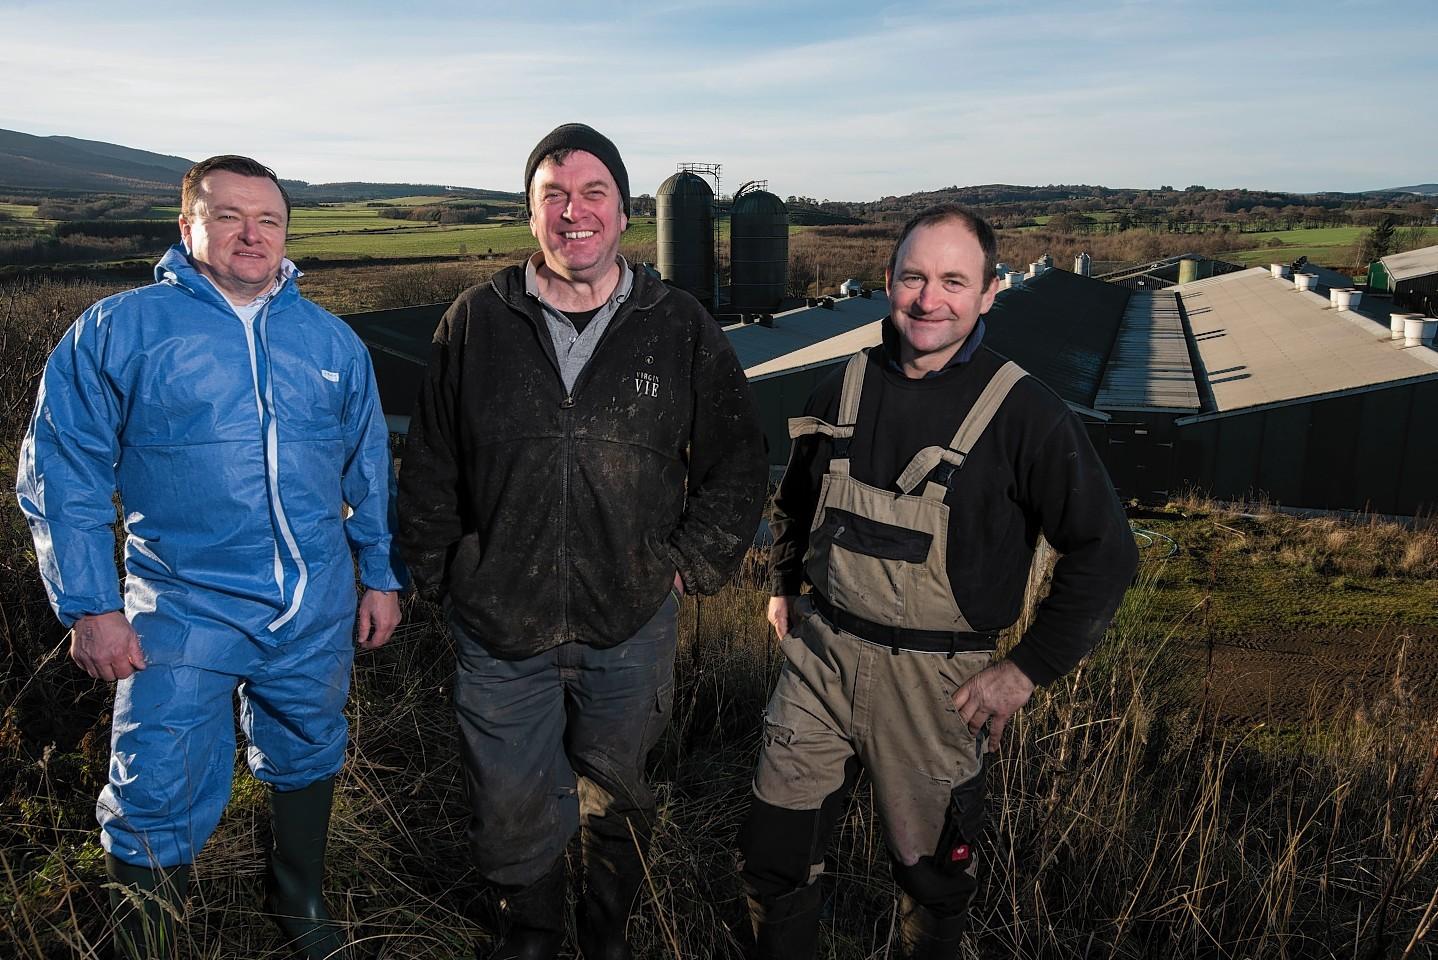 Allan Ward, Wayne Ducker and Patrick Stephen